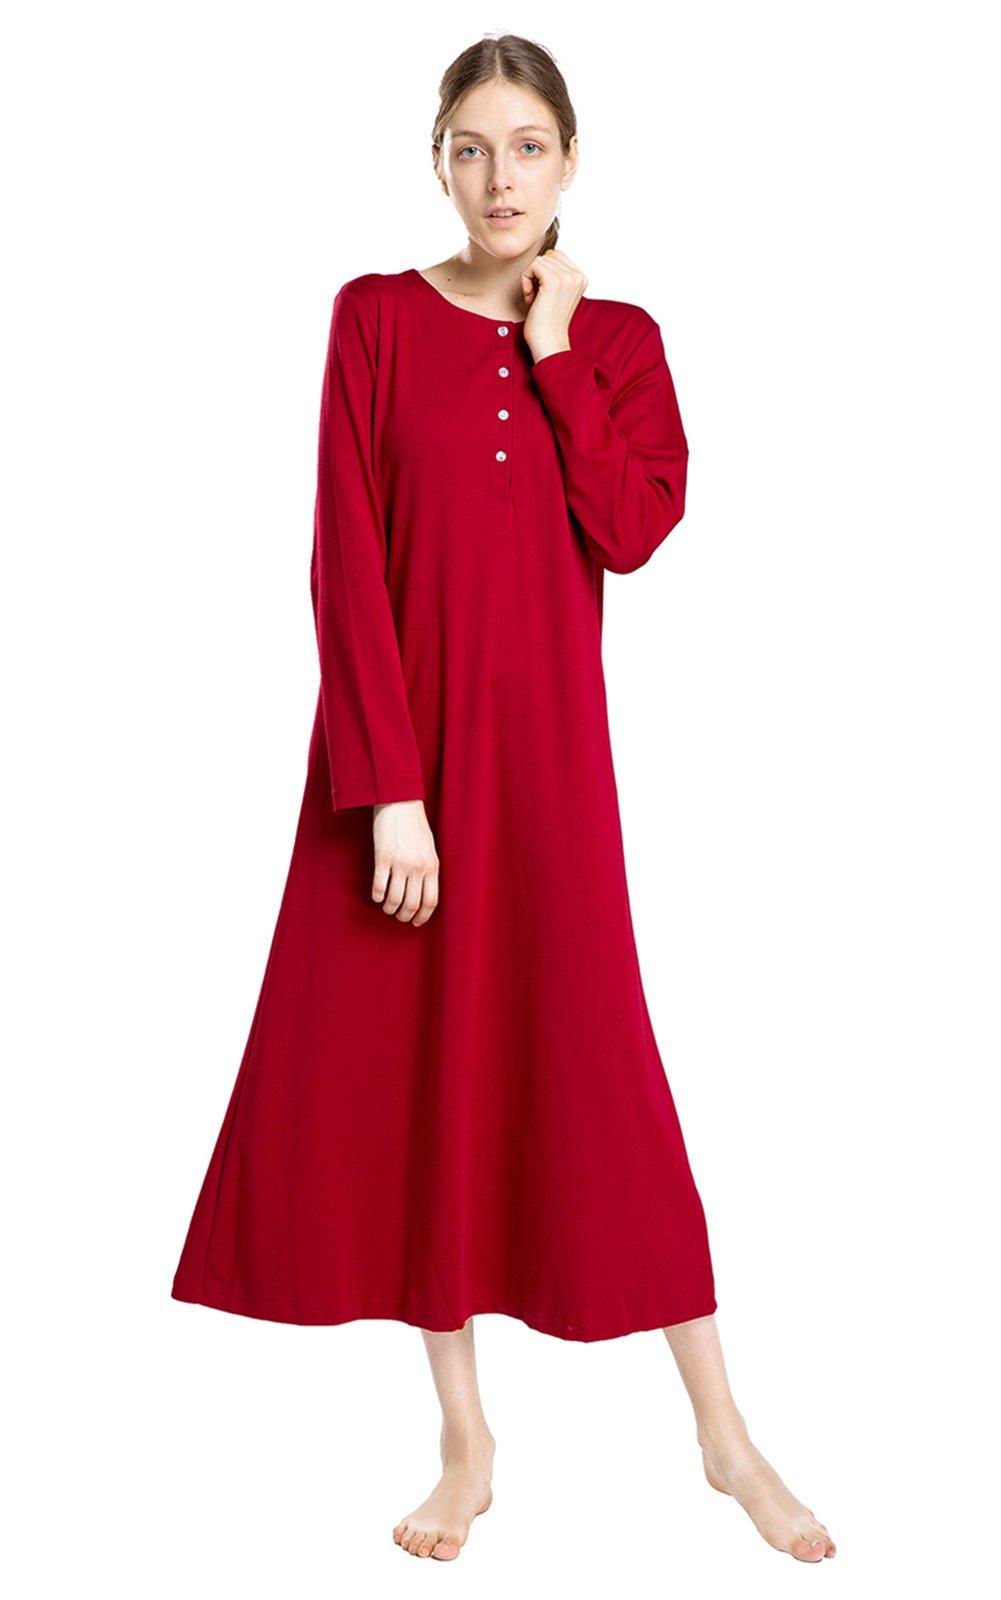 lantisan Cotton Knit Long Sleeve Nightgown for Women, Henley Full Length Sleep Dress, WineRed L